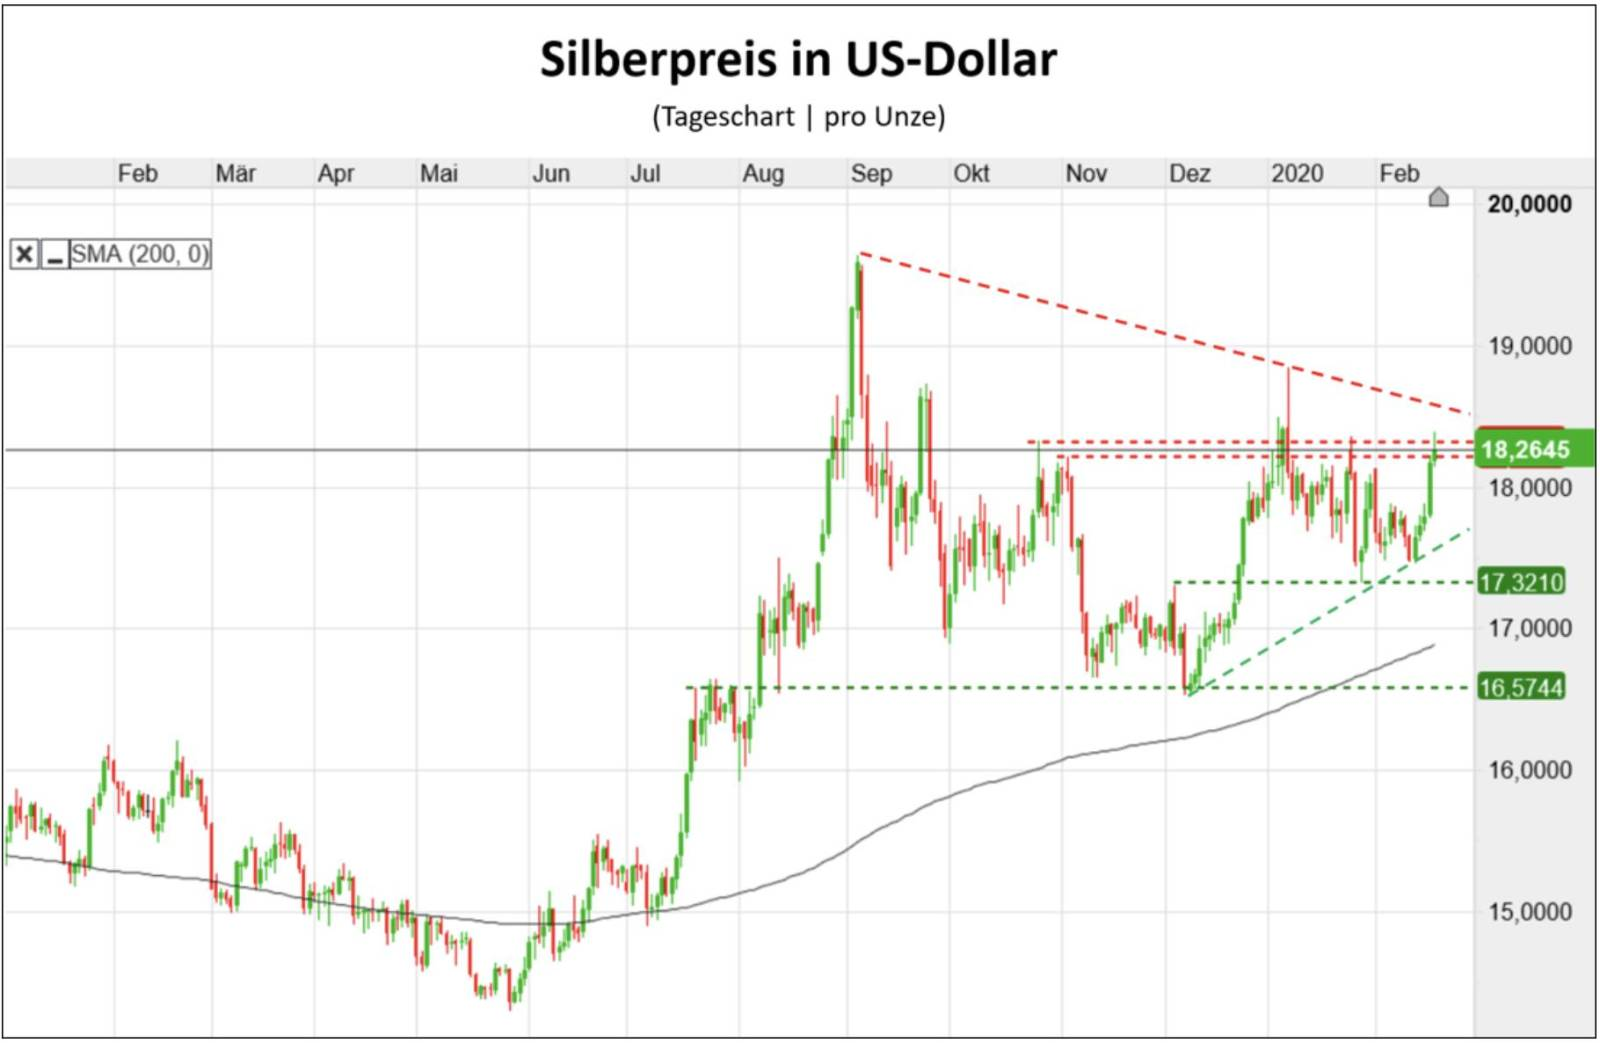 Silberpreis Chart in US-Dollar